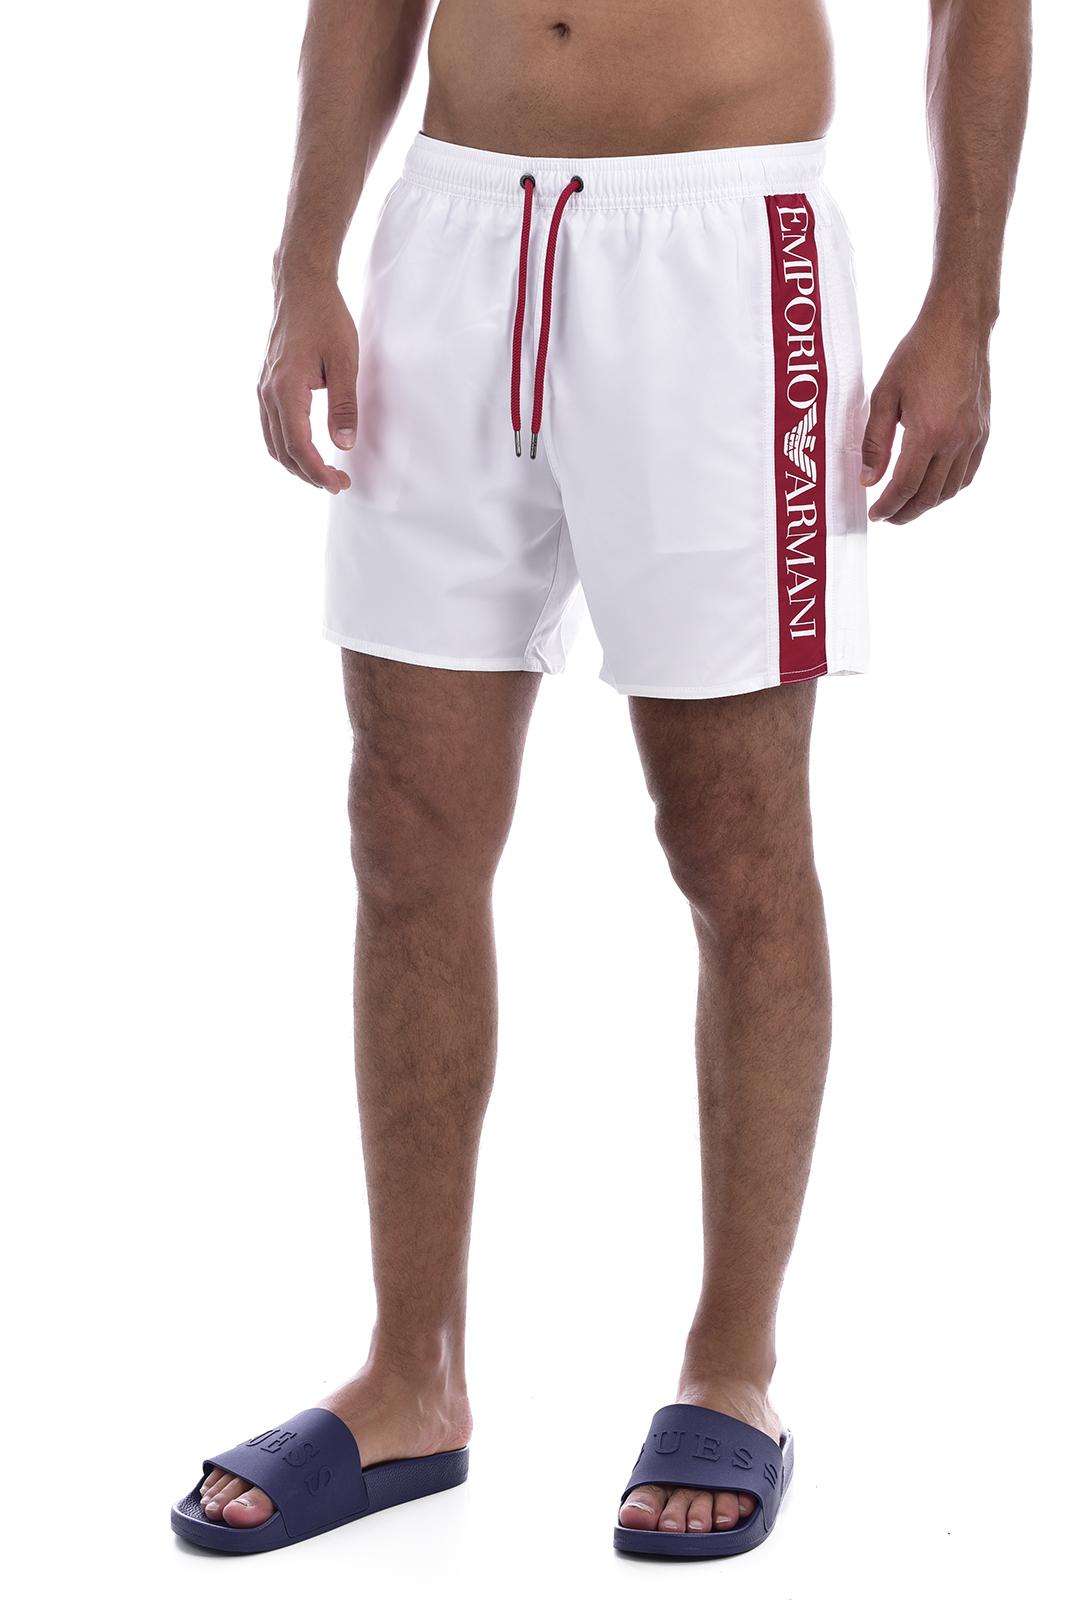 Shorts de bain  Emporio armani 211740 0P425 00010 BIANCO